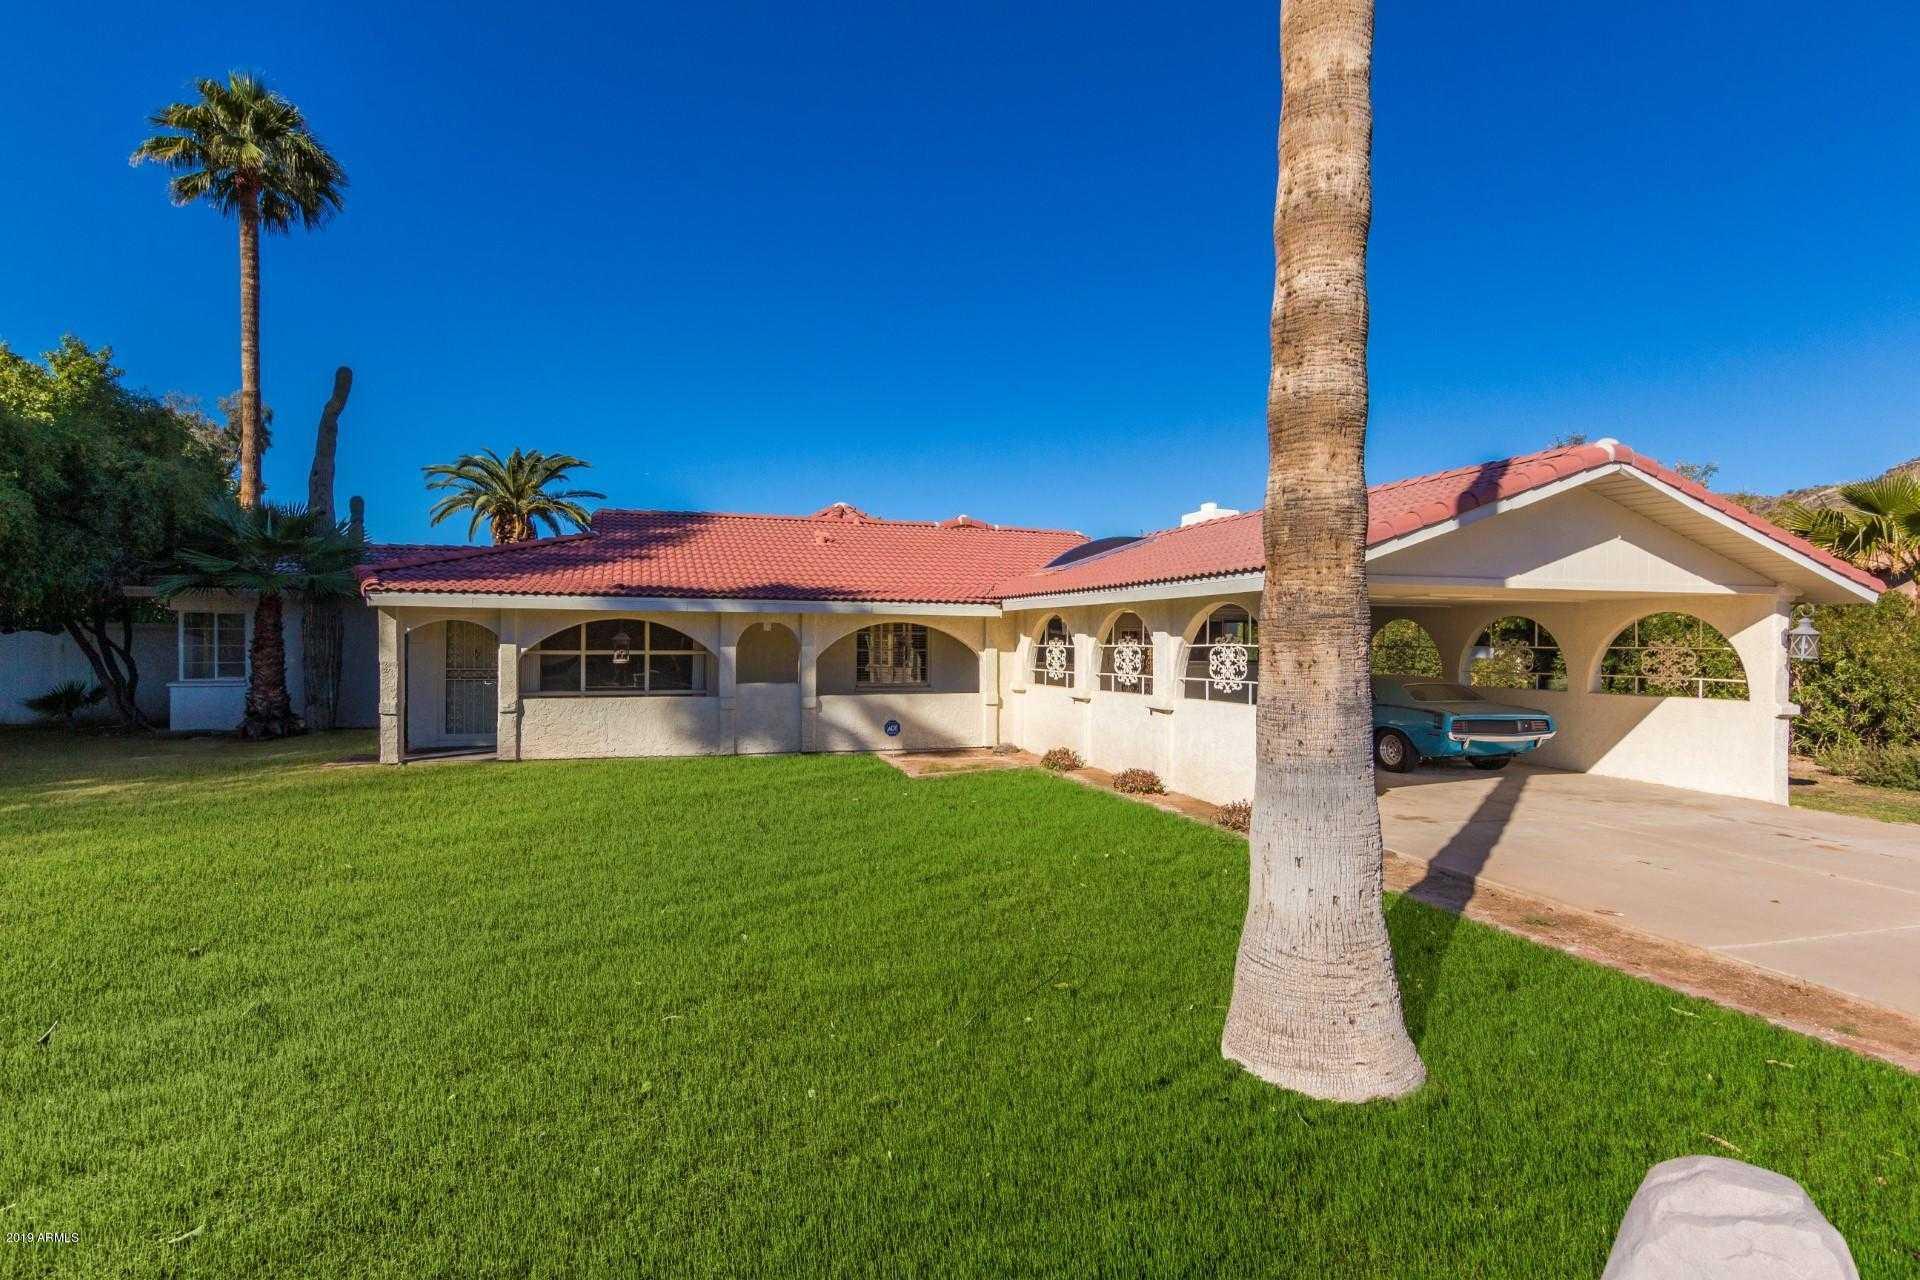 $900,000 - 3Br/3Ba - Home for Sale in Scottsdale Desert Est, Paradise Valley